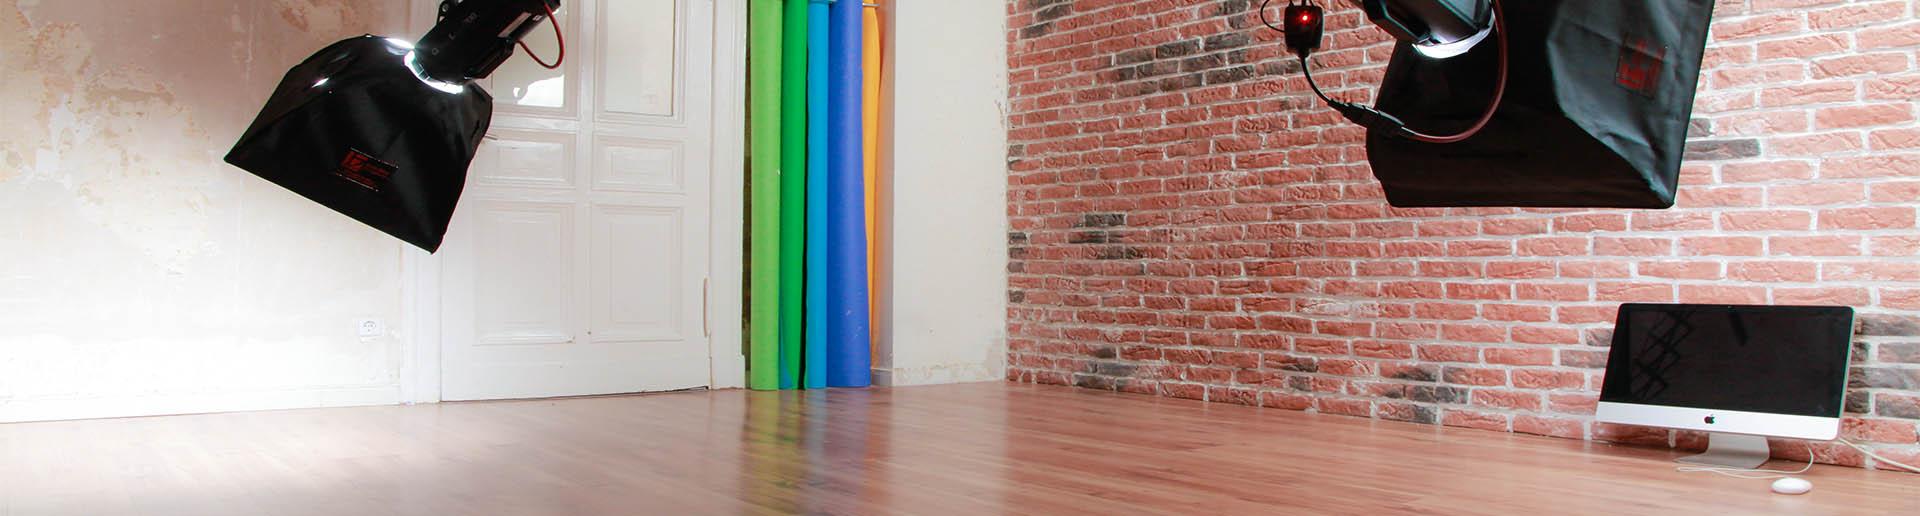 mietfotostudio berlin grundriss fotostudio mieten in. Black Bedroom Furniture Sets. Home Design Ideas